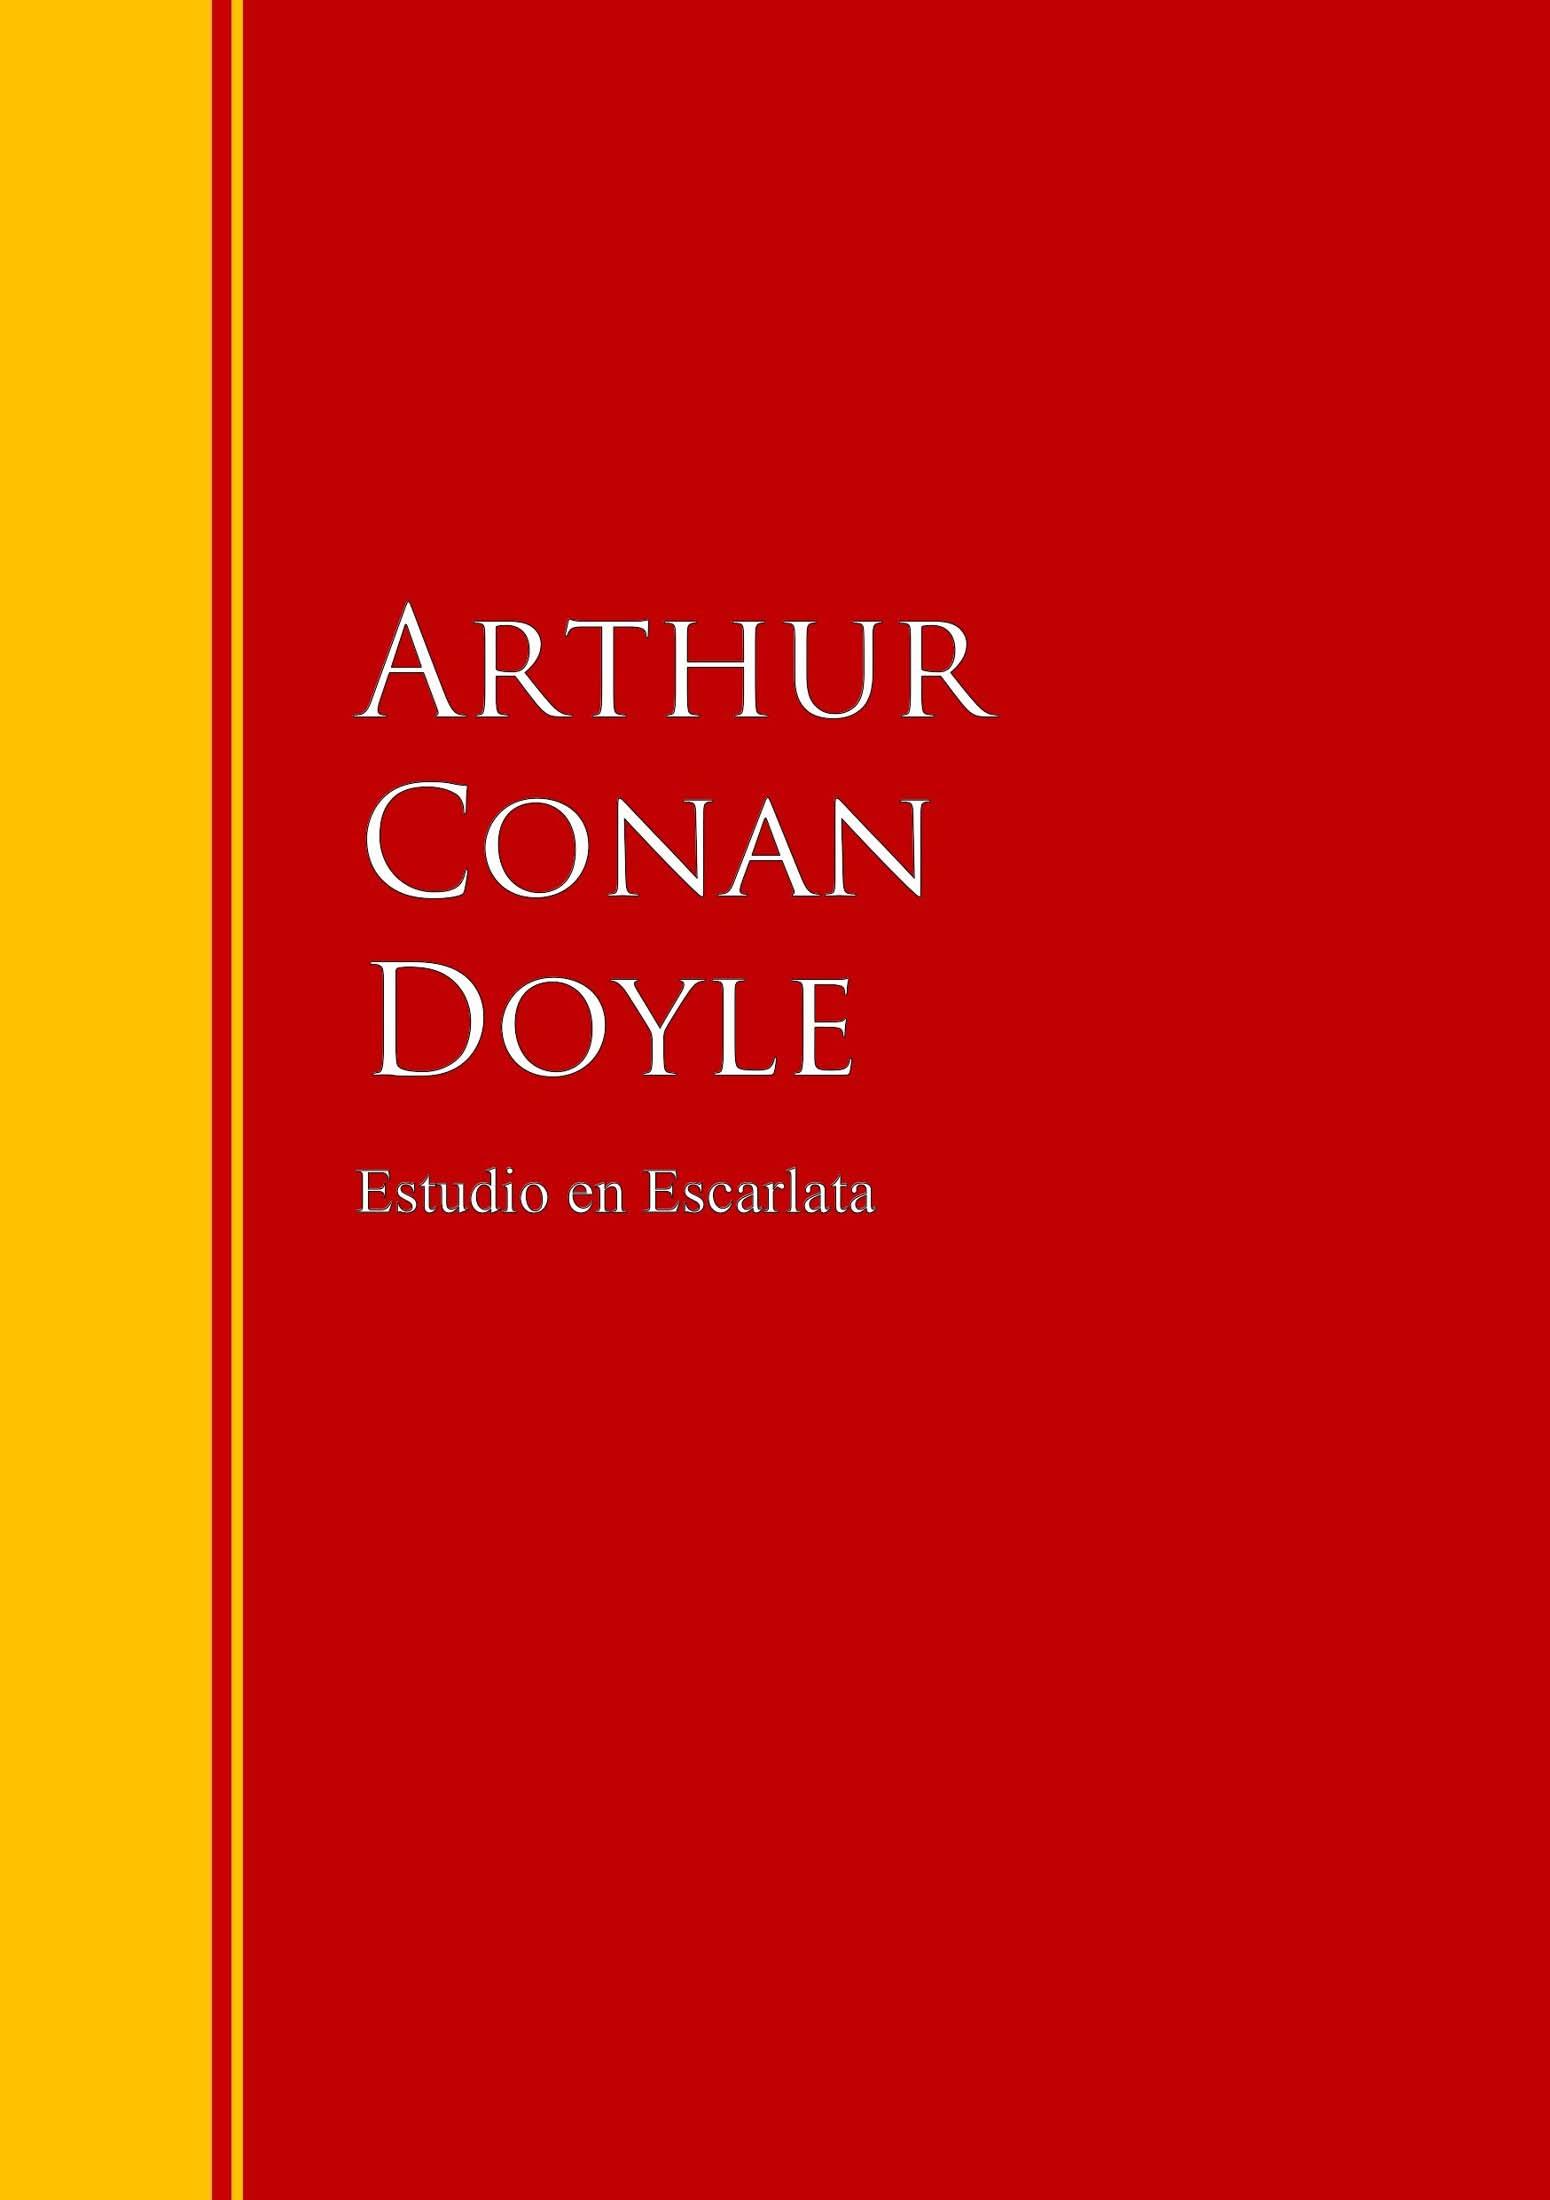 Артур Конан Дойл Estudio en Escarlata